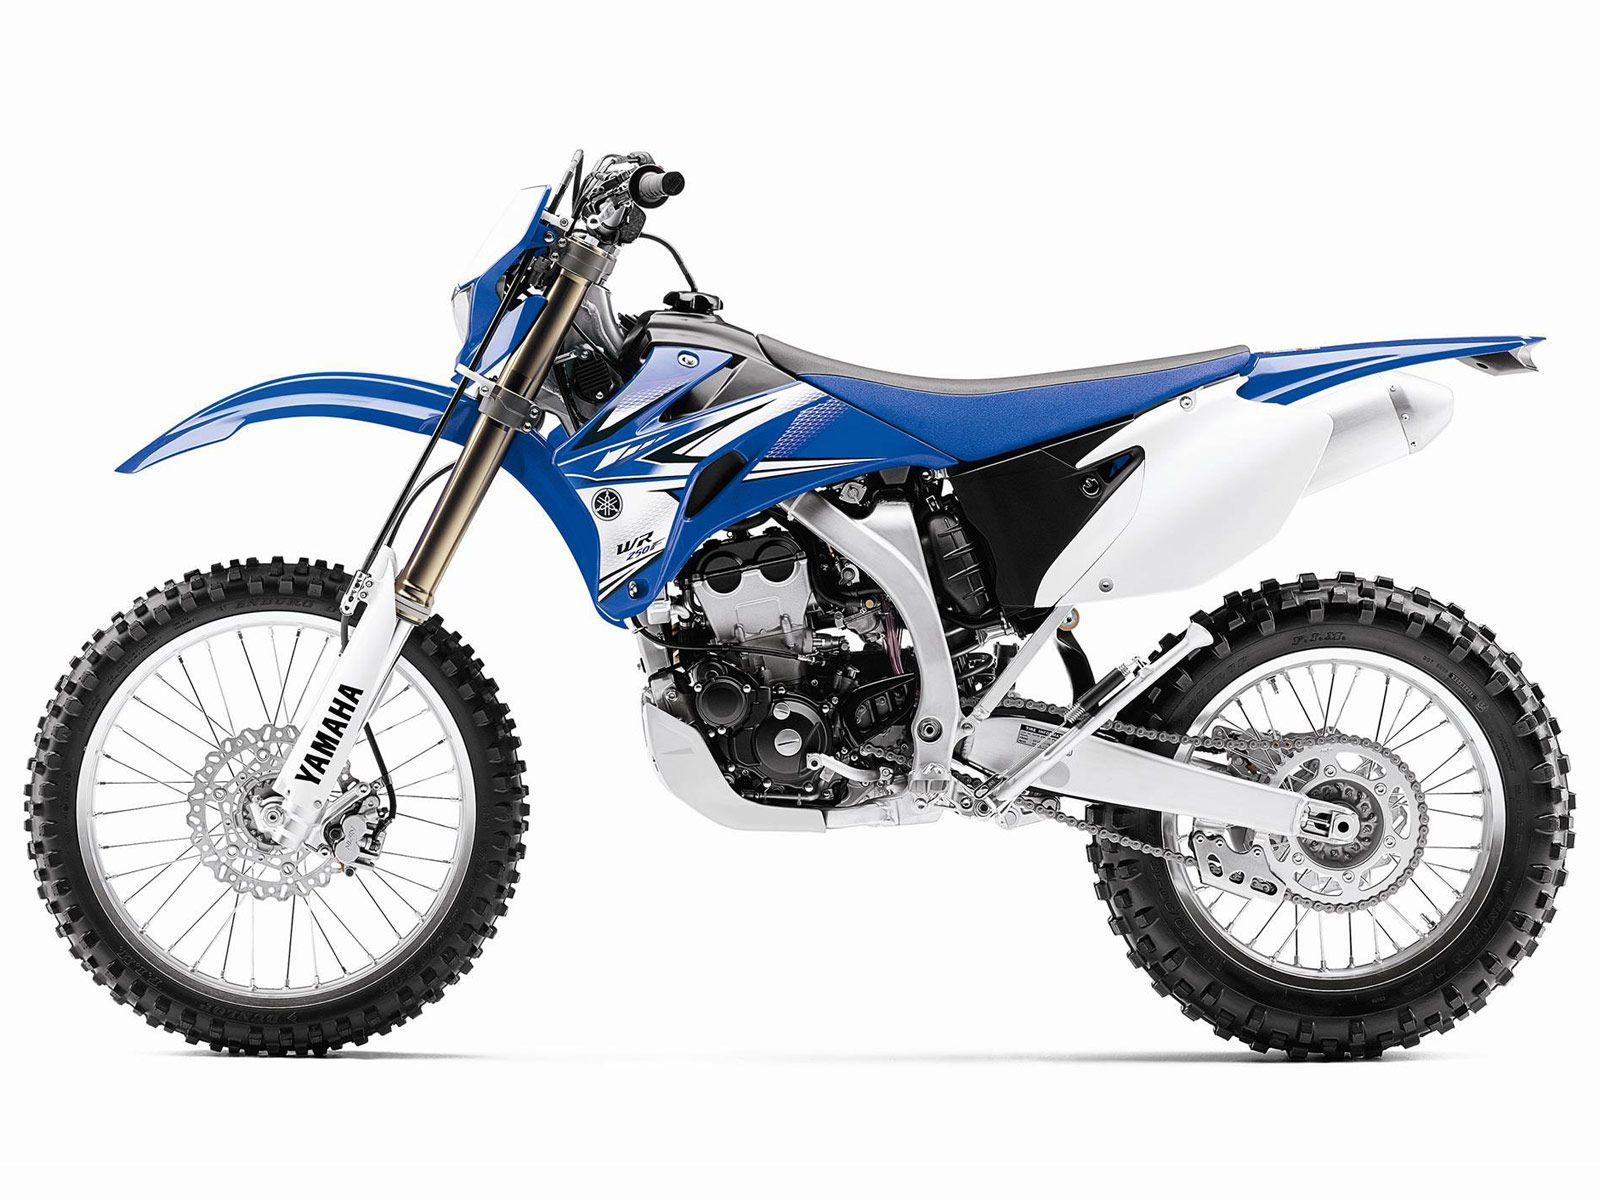 1 1 Typu Upside Down Widelec Odwrocony Usd Yamaha Wr 400 F Z 2012 Roku Repair Manuals Yamaha Adventure Bike